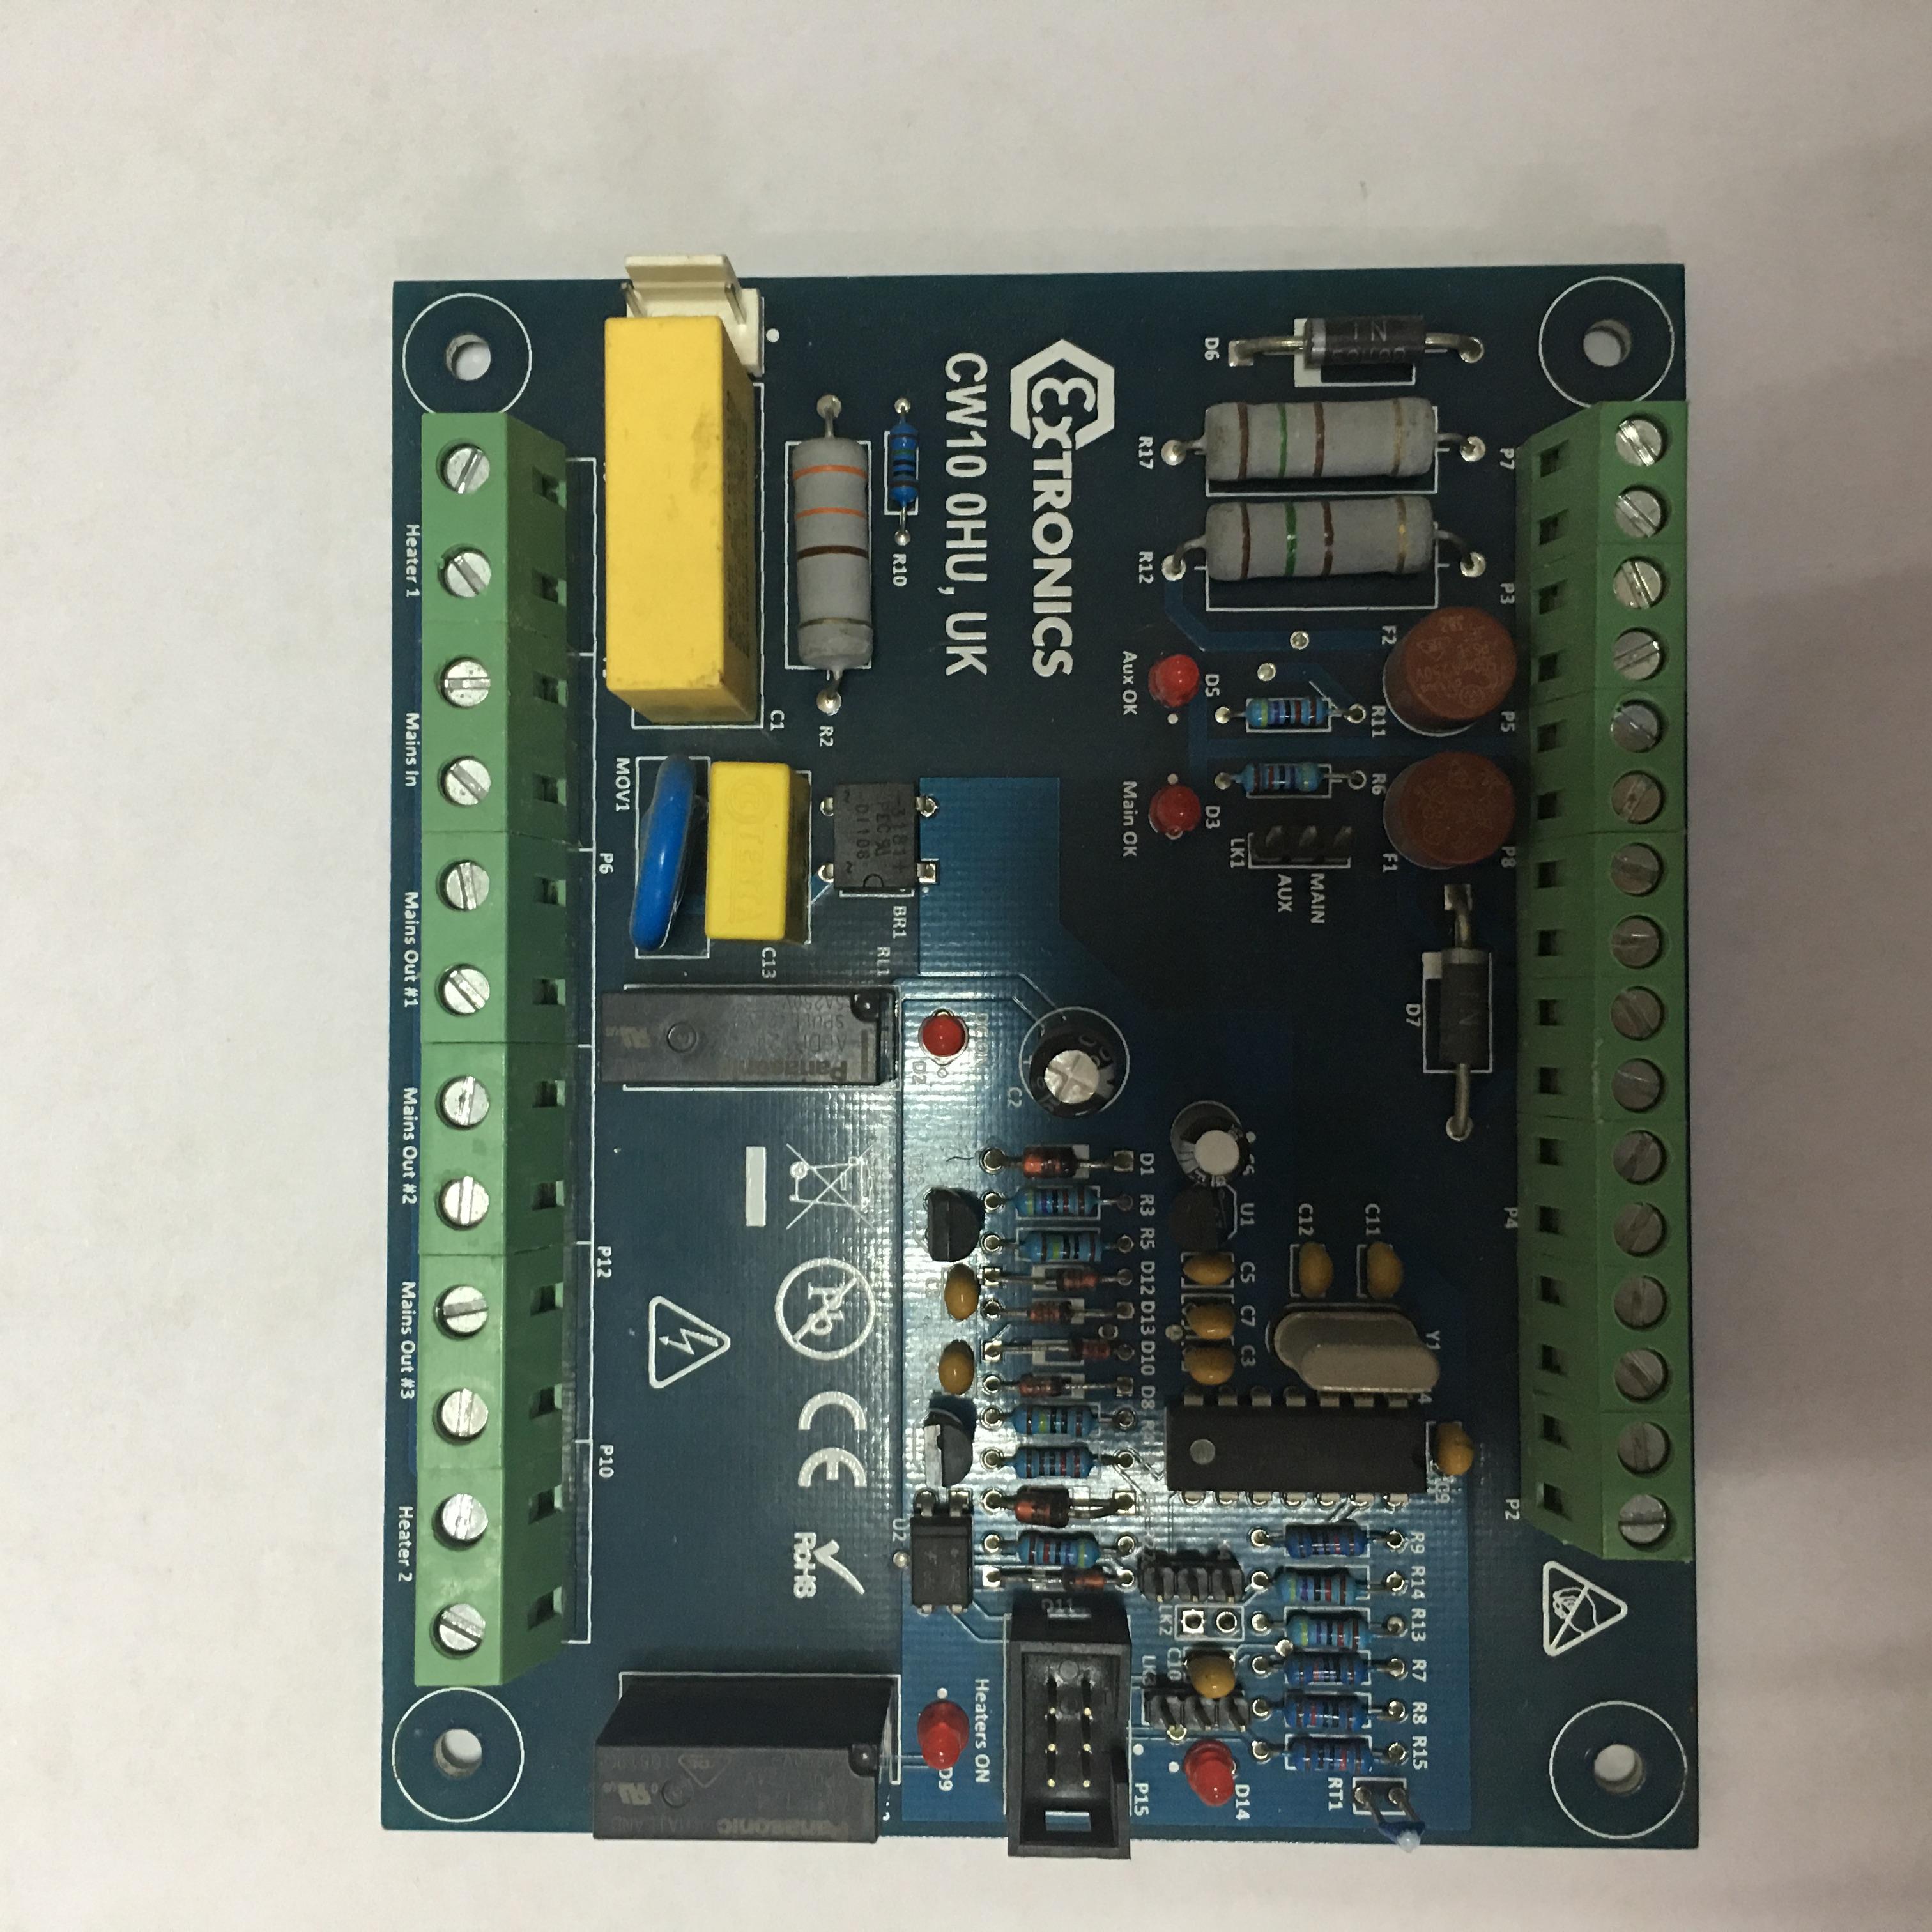 Pcbpcba Oem Manufacturer Electronic Circuit Board Pcb Assembly Switch Pcbpcb Boardpcb Manufacturing Product Pcba Service Buy Designpcba On Alibabacom